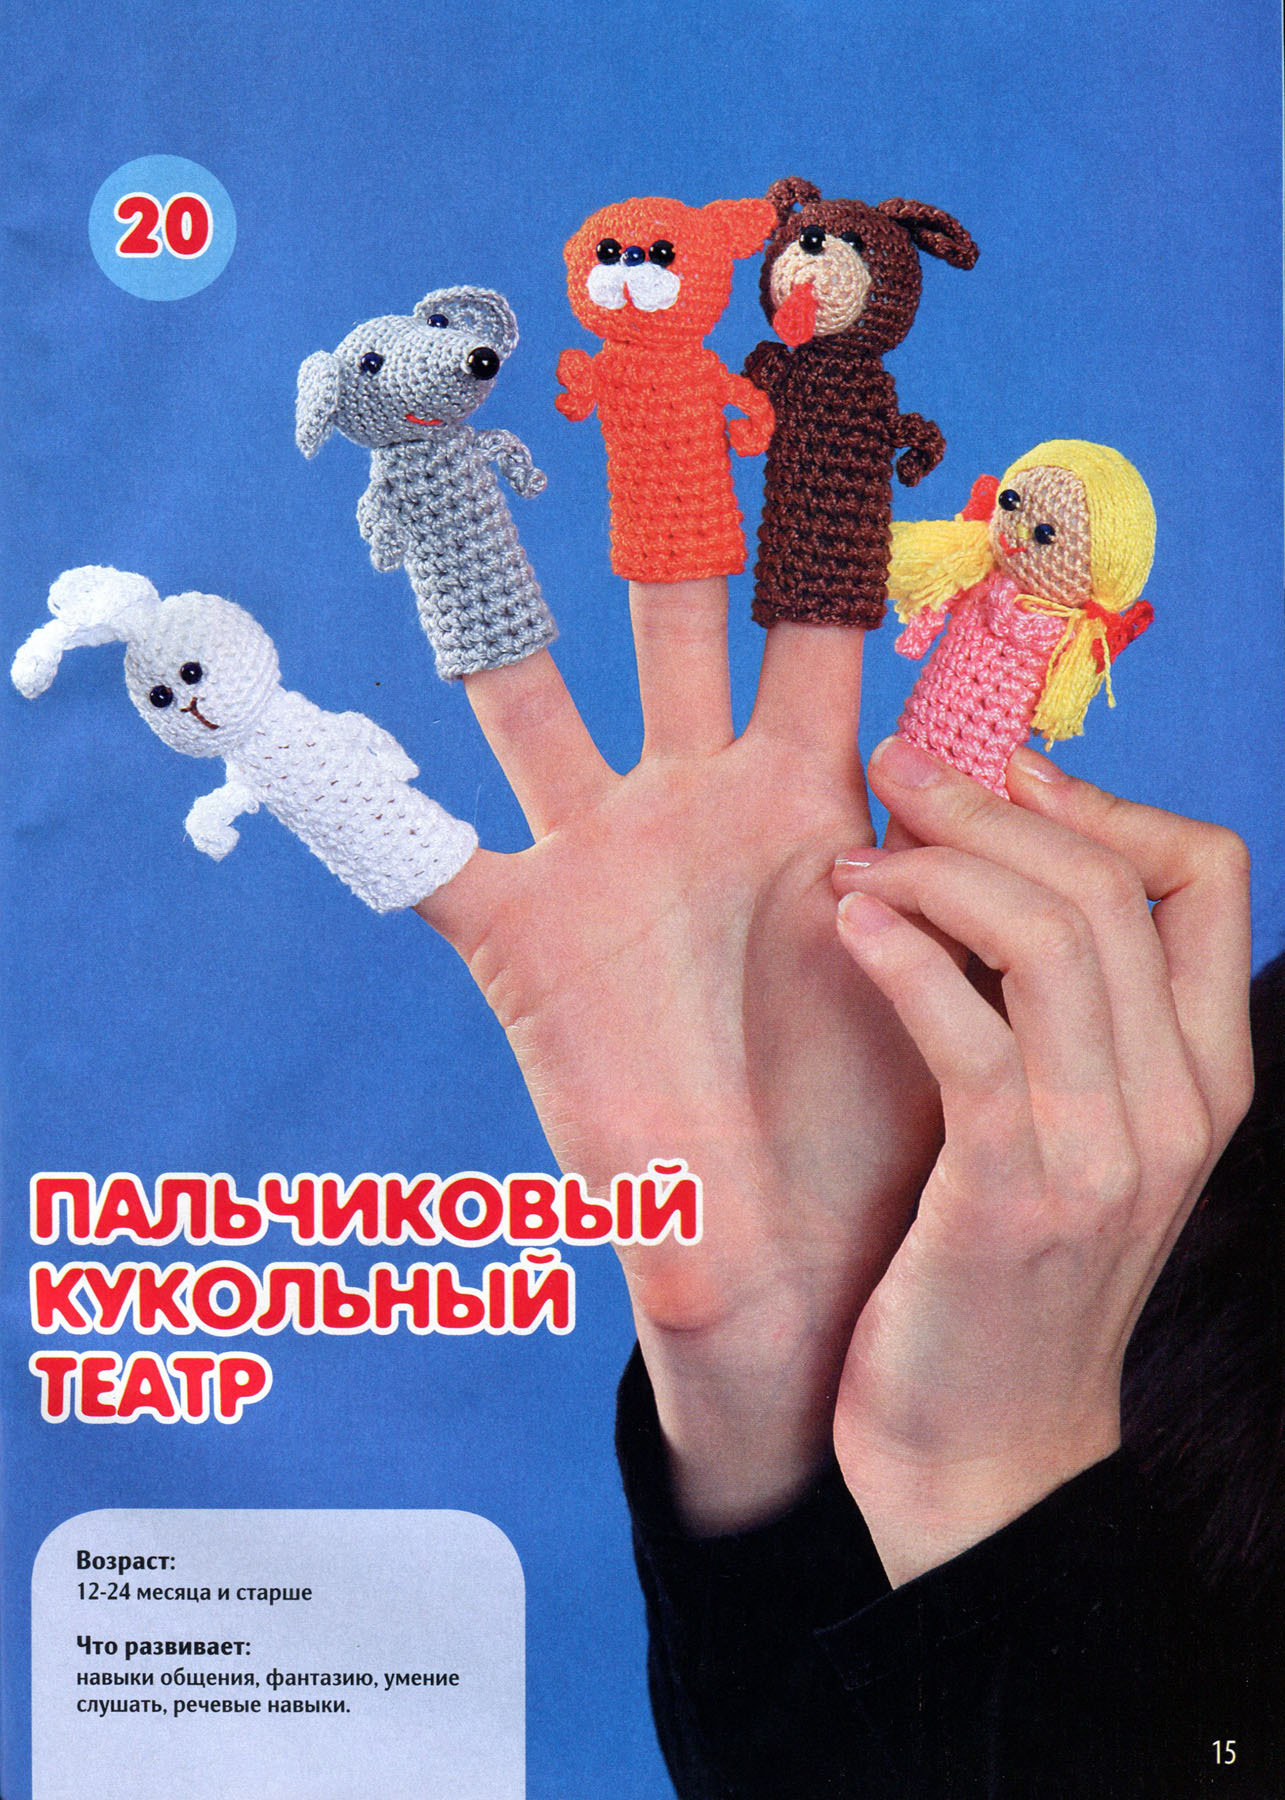 http://amigurumi.com.ua/forum/uploads/photo/192/7d8f7a4ae8ab9331a3b14a2c5a80649e.jpg